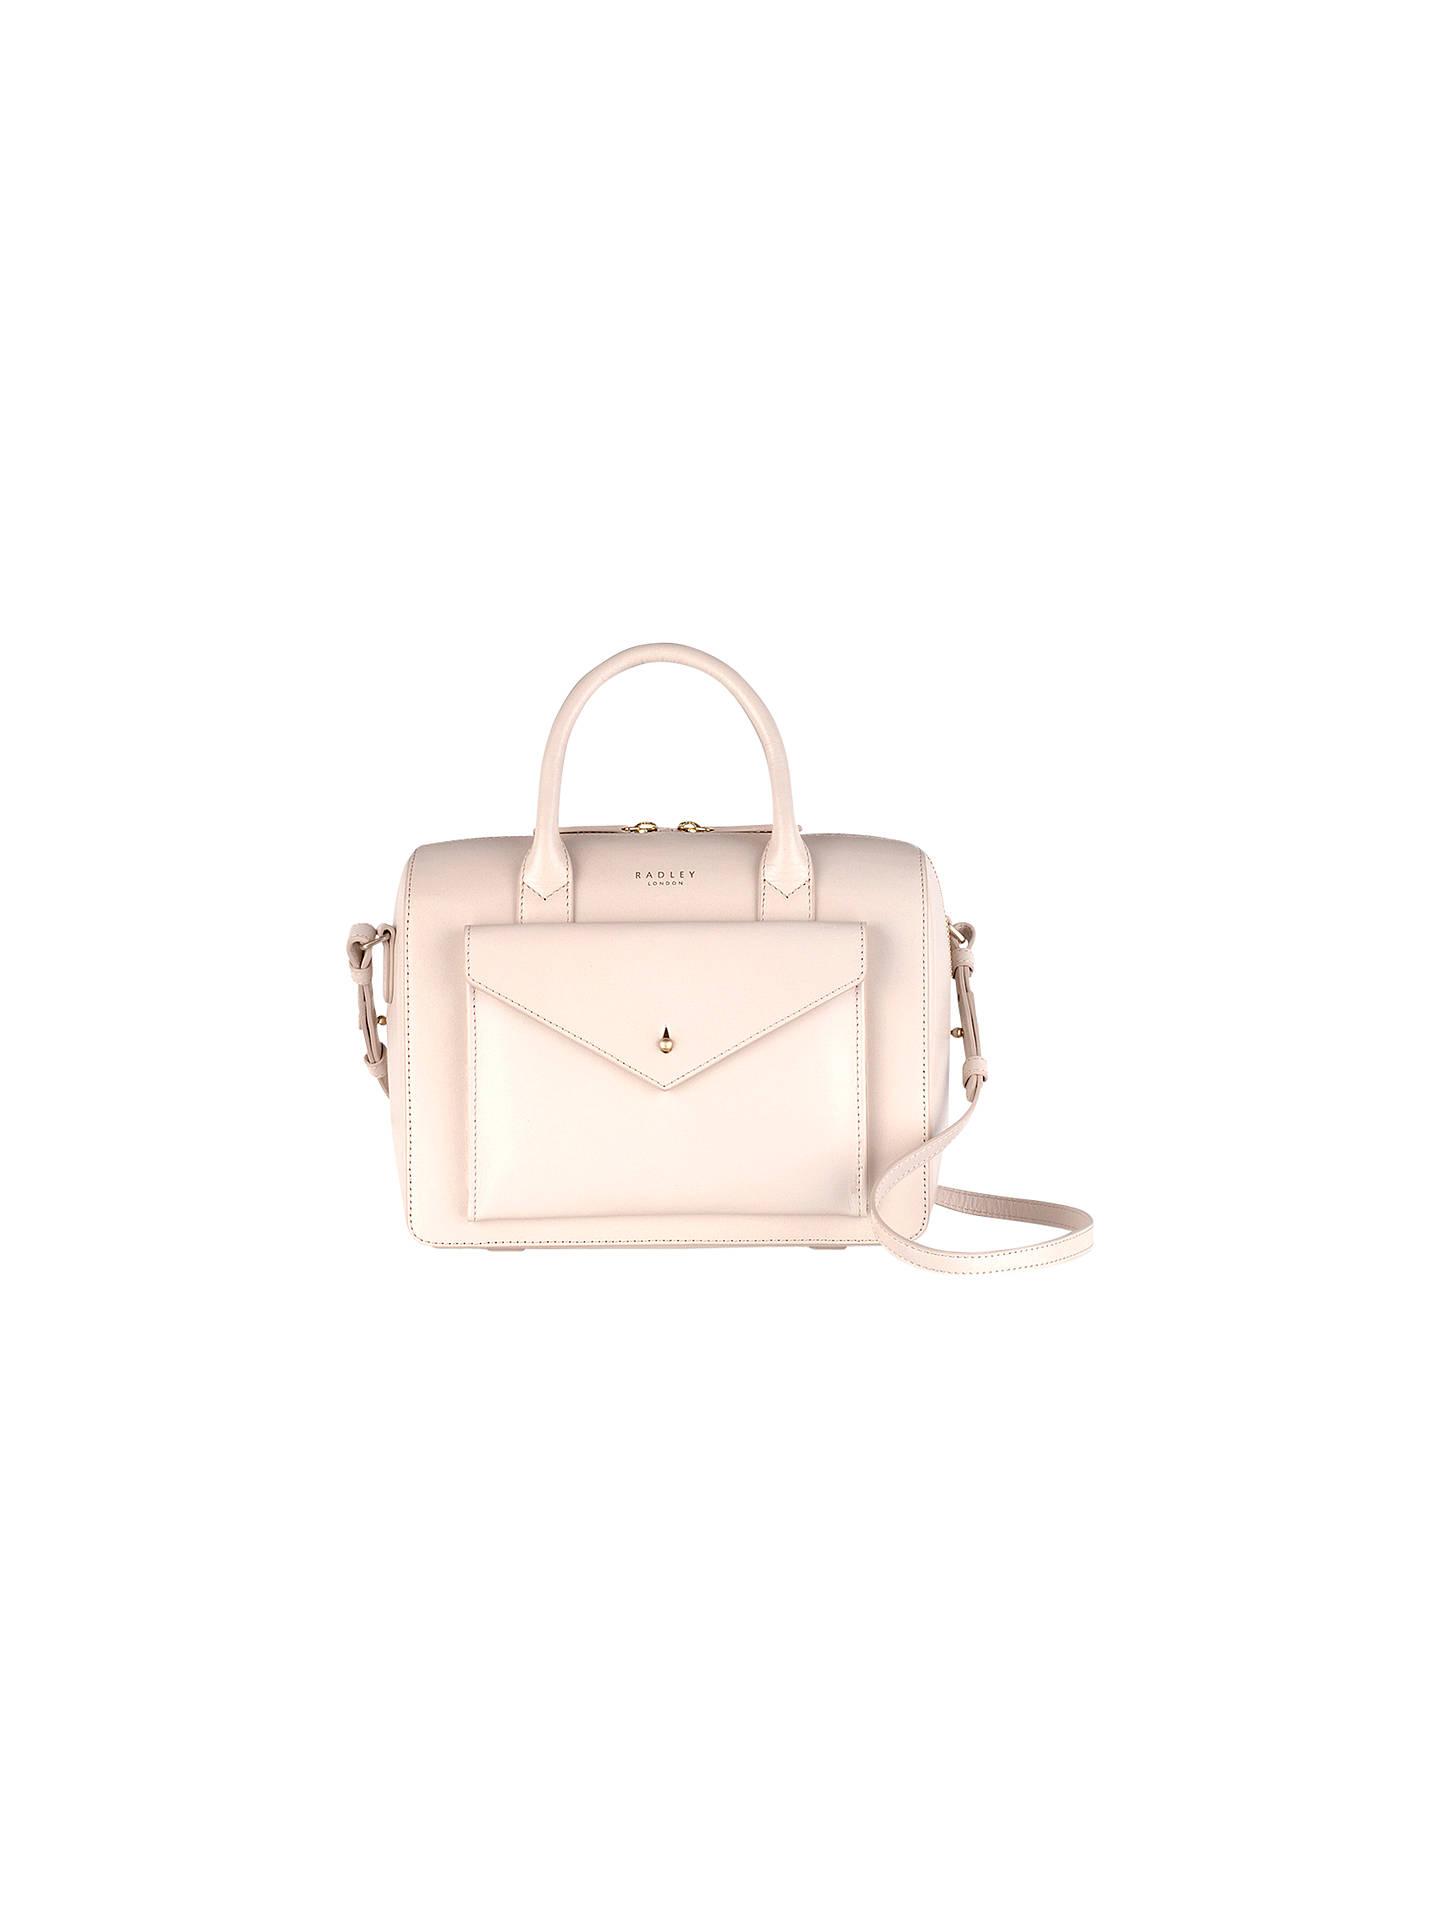 688161778bd1 BuyRadley Keats Grove Leather Multiway Bag